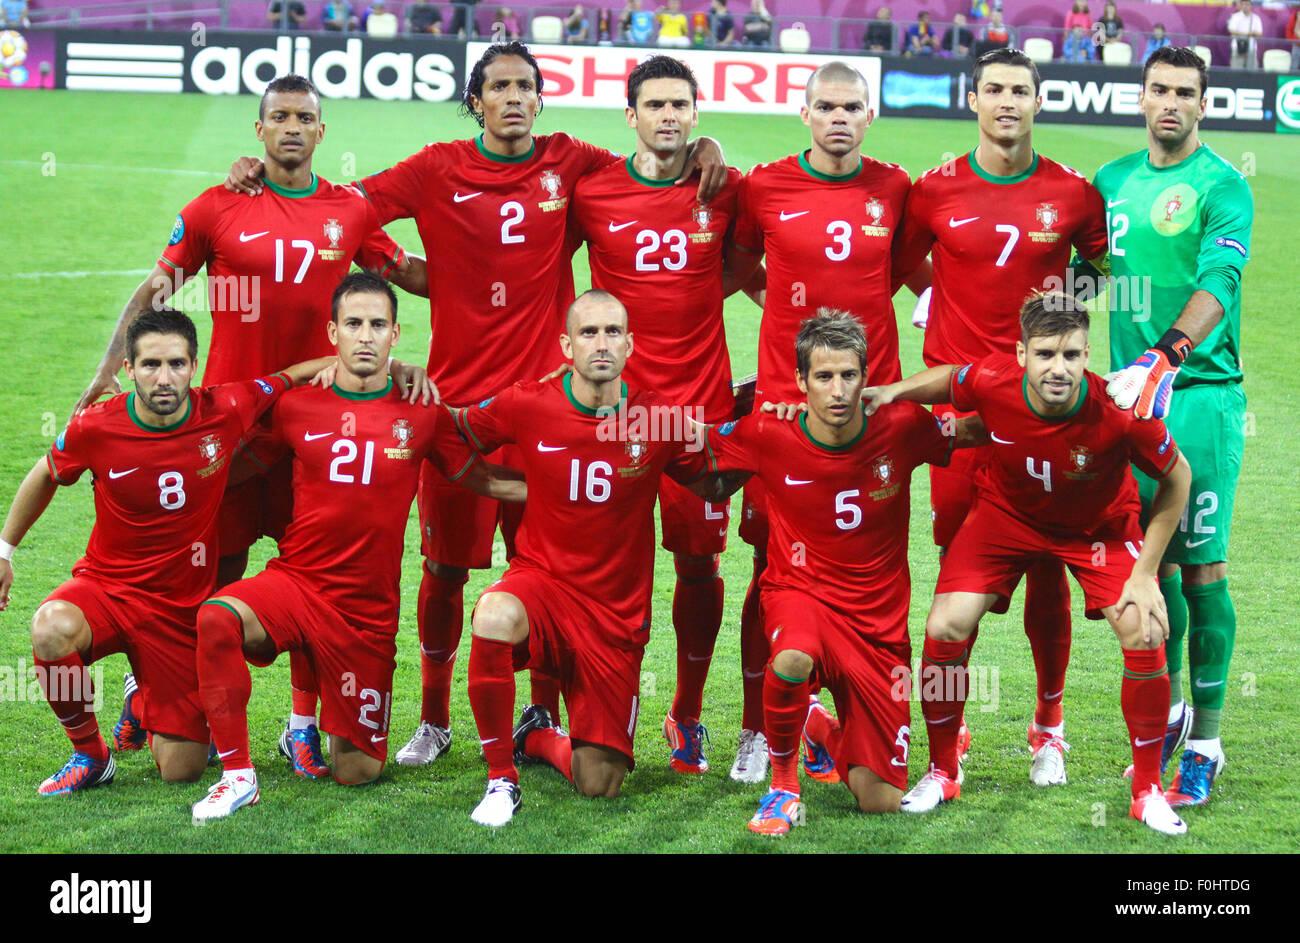 512d2b074 LVIV, UKRAINE - JUNE 9, 2012: Portugal national football team pose for a